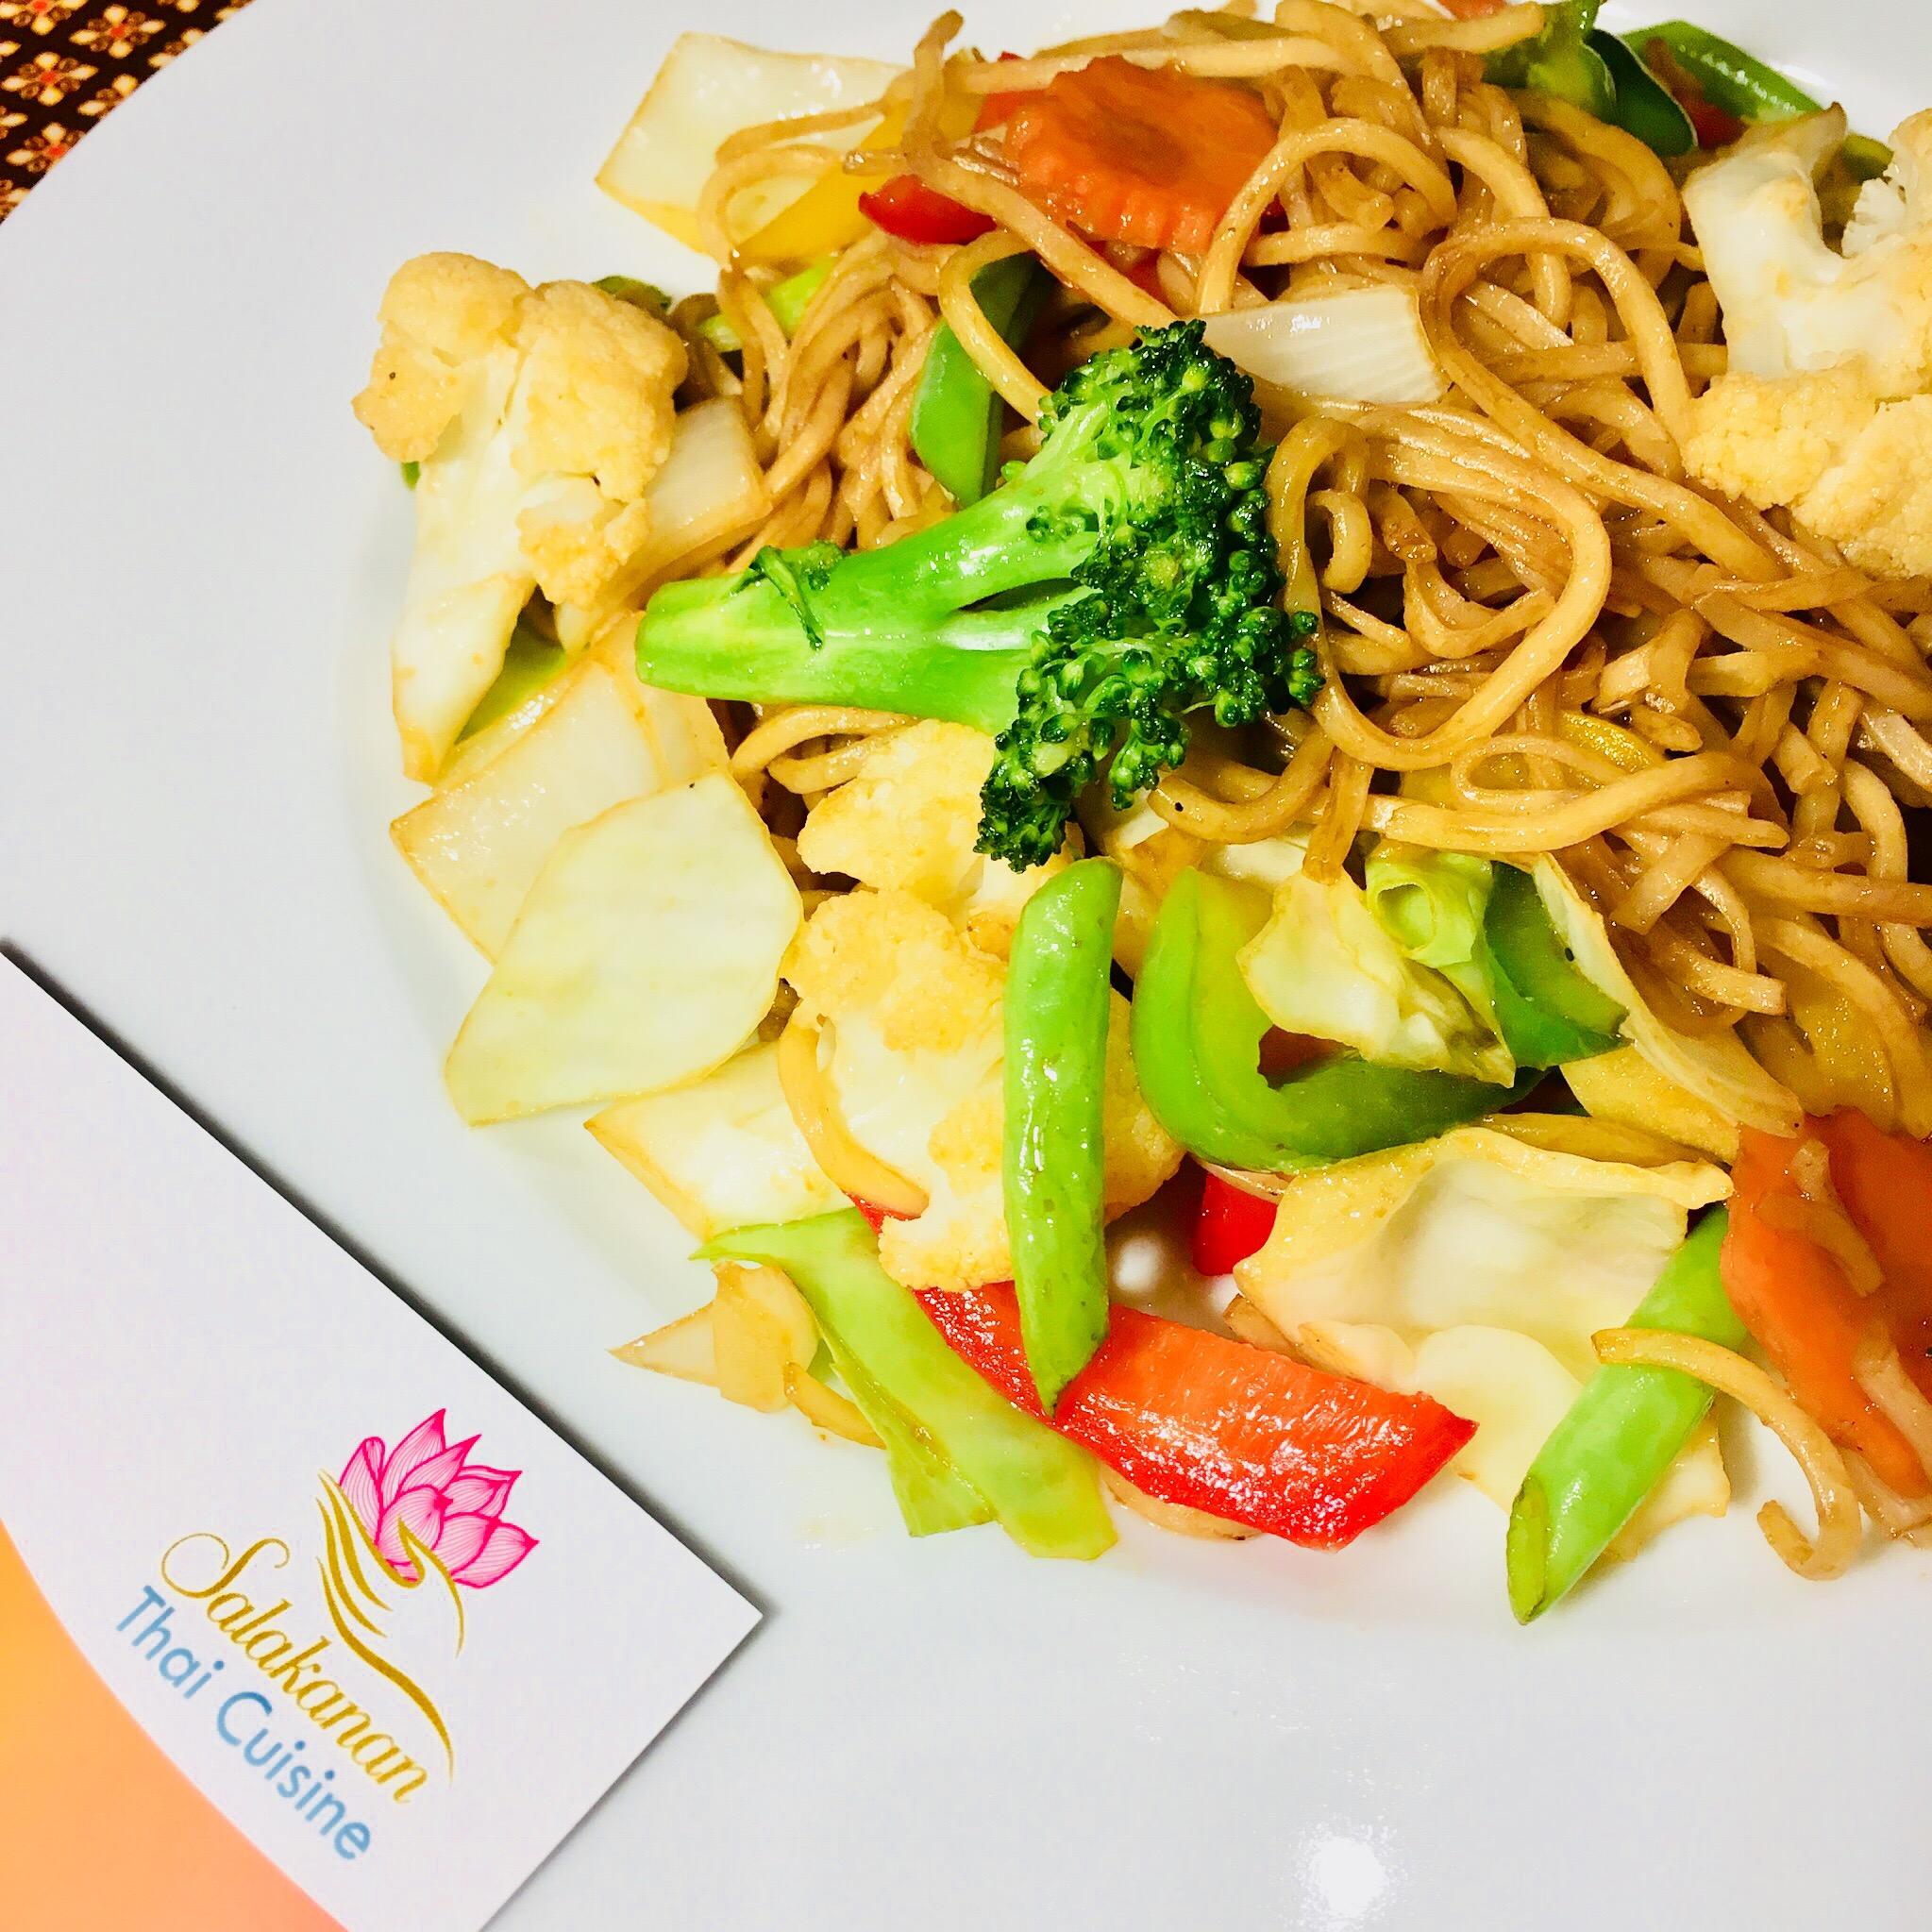 nudeln SALAKANAN thai restaurant Offenburg